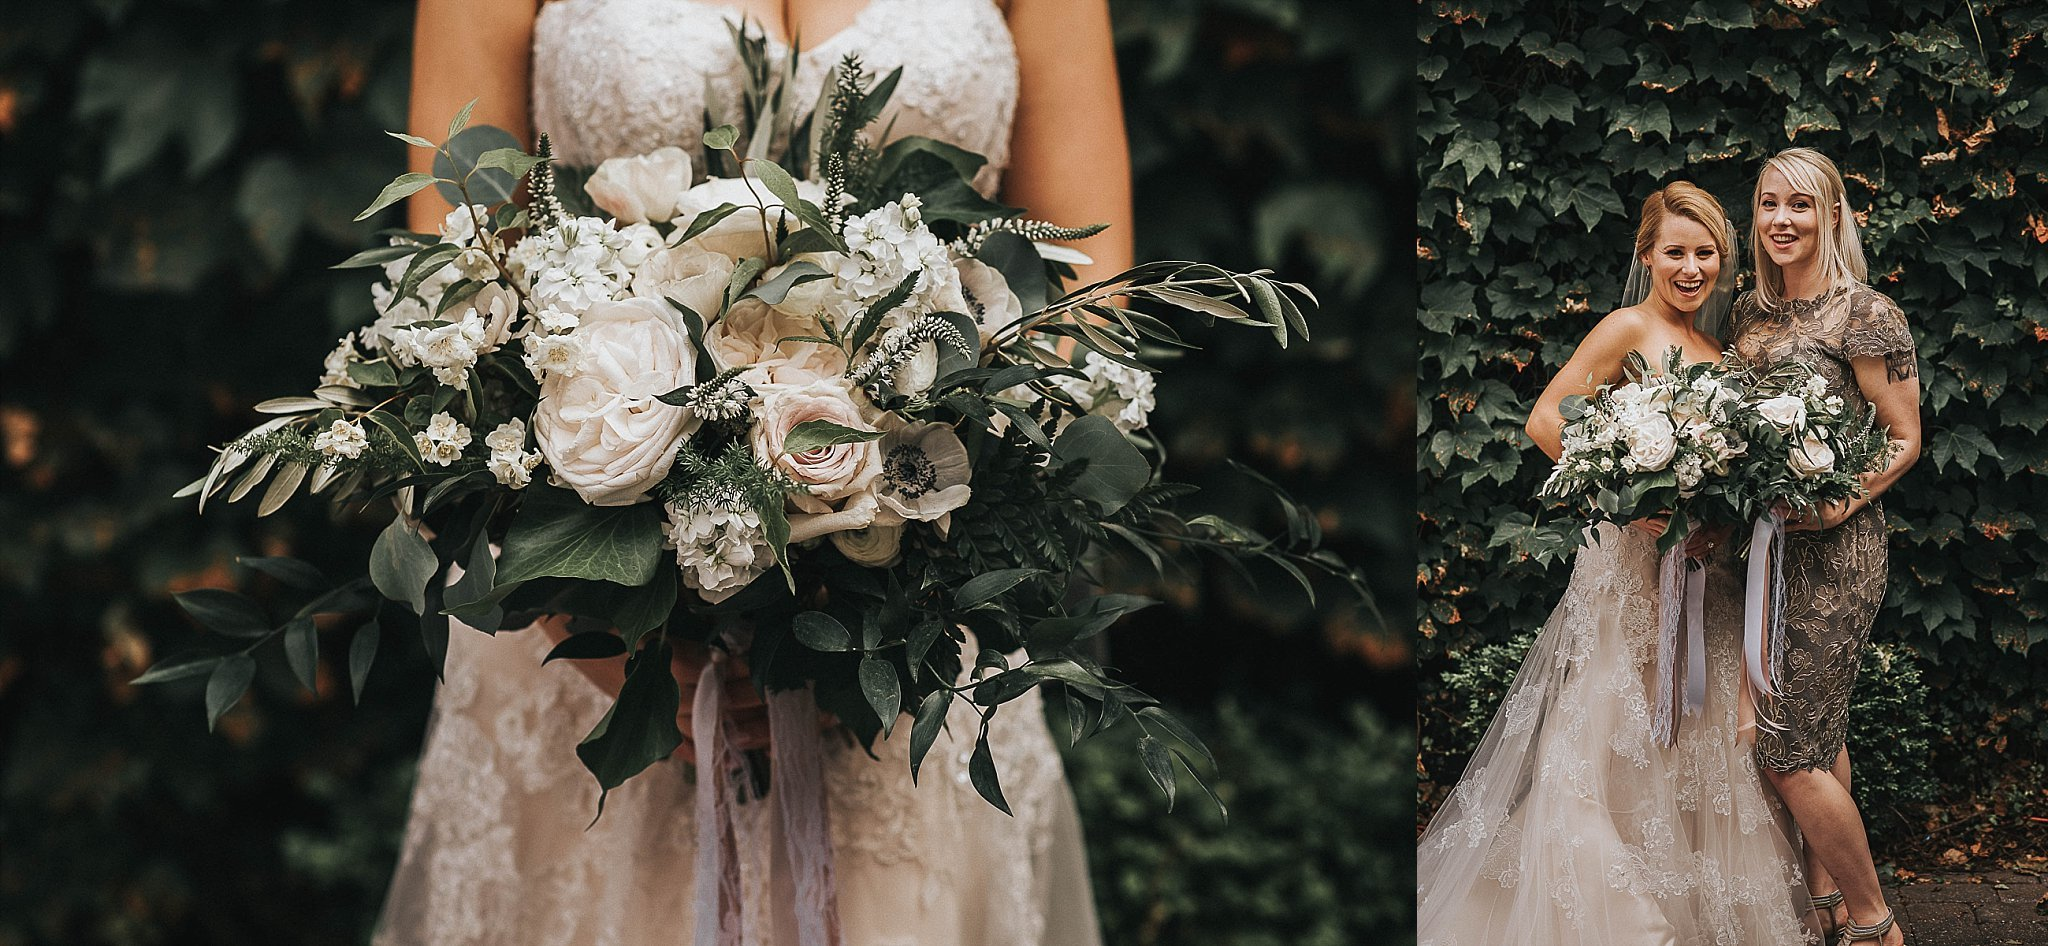 St. Louis Wedding Photos